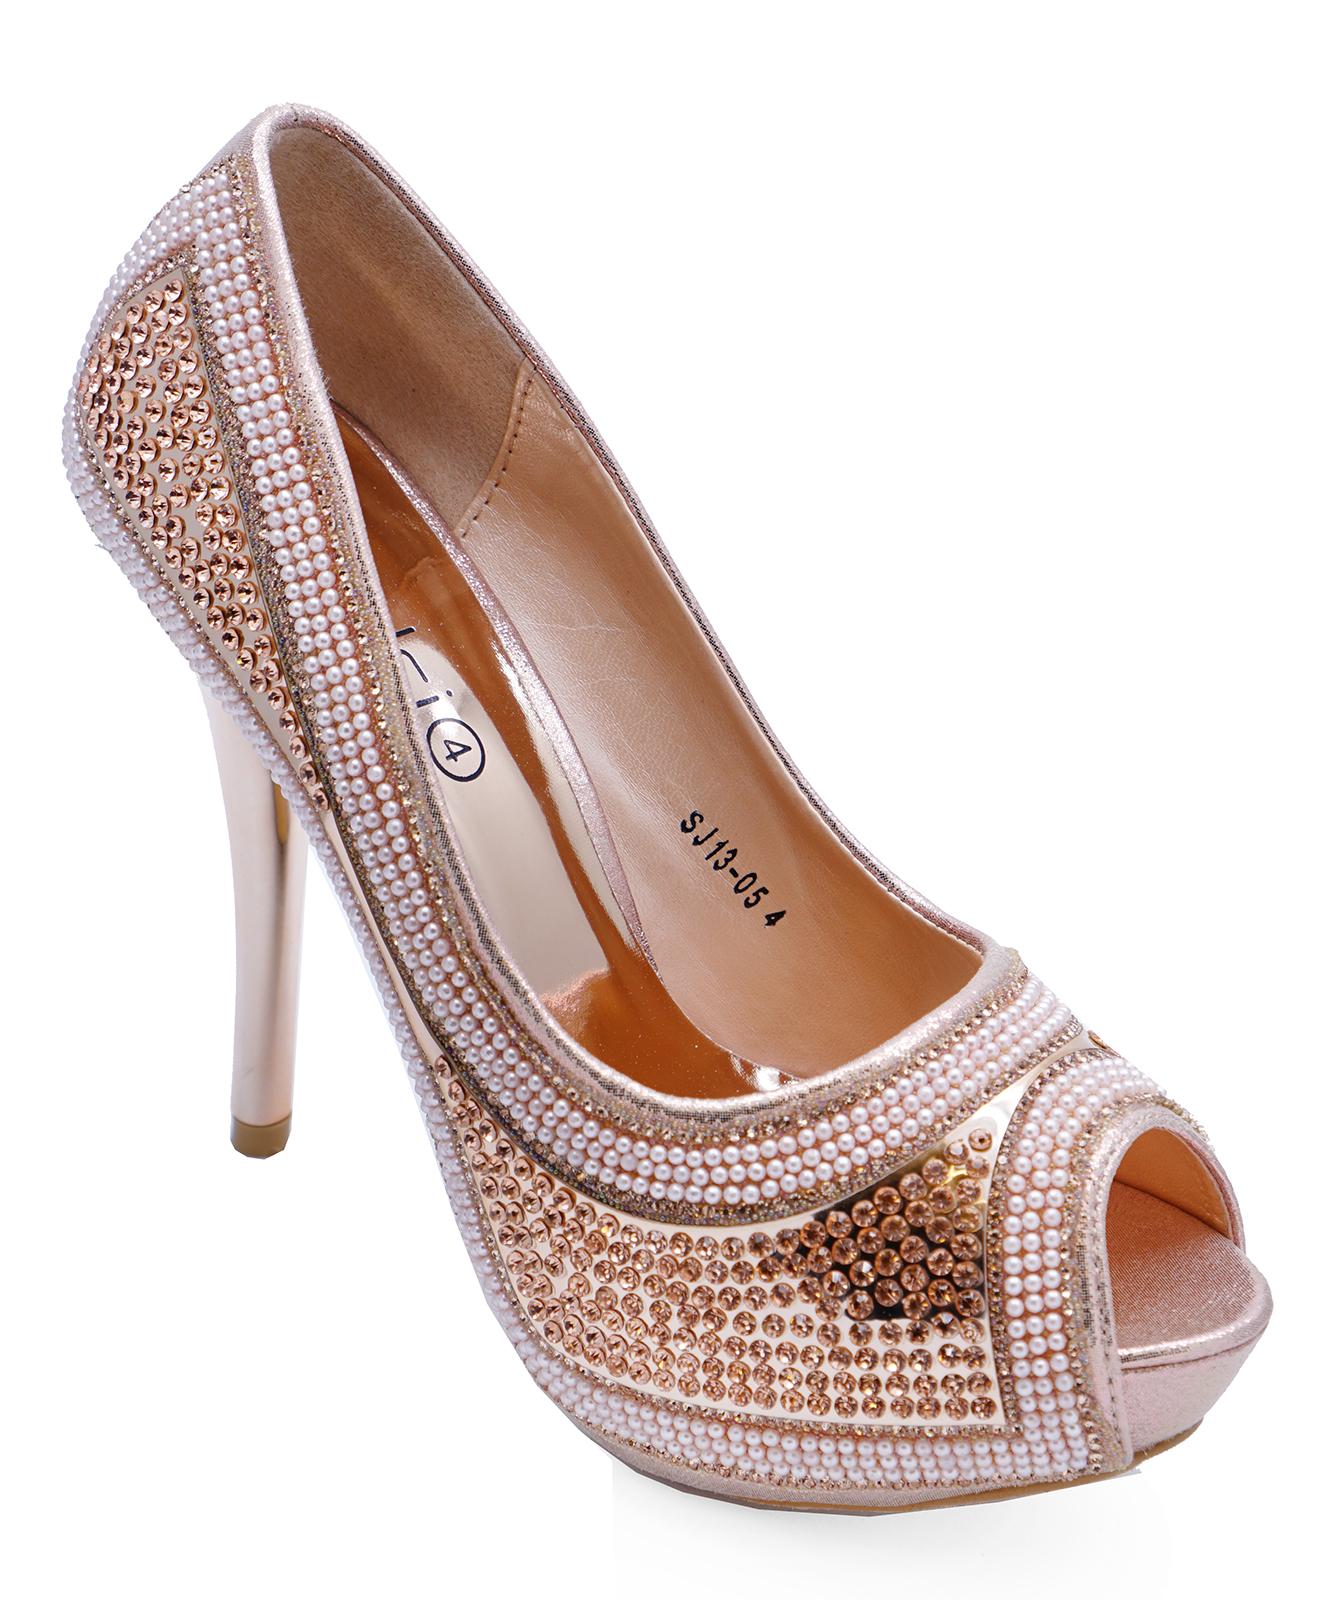 9541d3a4796c Sentinel LADIES ROSE GOLD DIAMANTE WEDDING BRIDESMAID PROM PEEP-TOE PARTY  SHOES UK 3-7